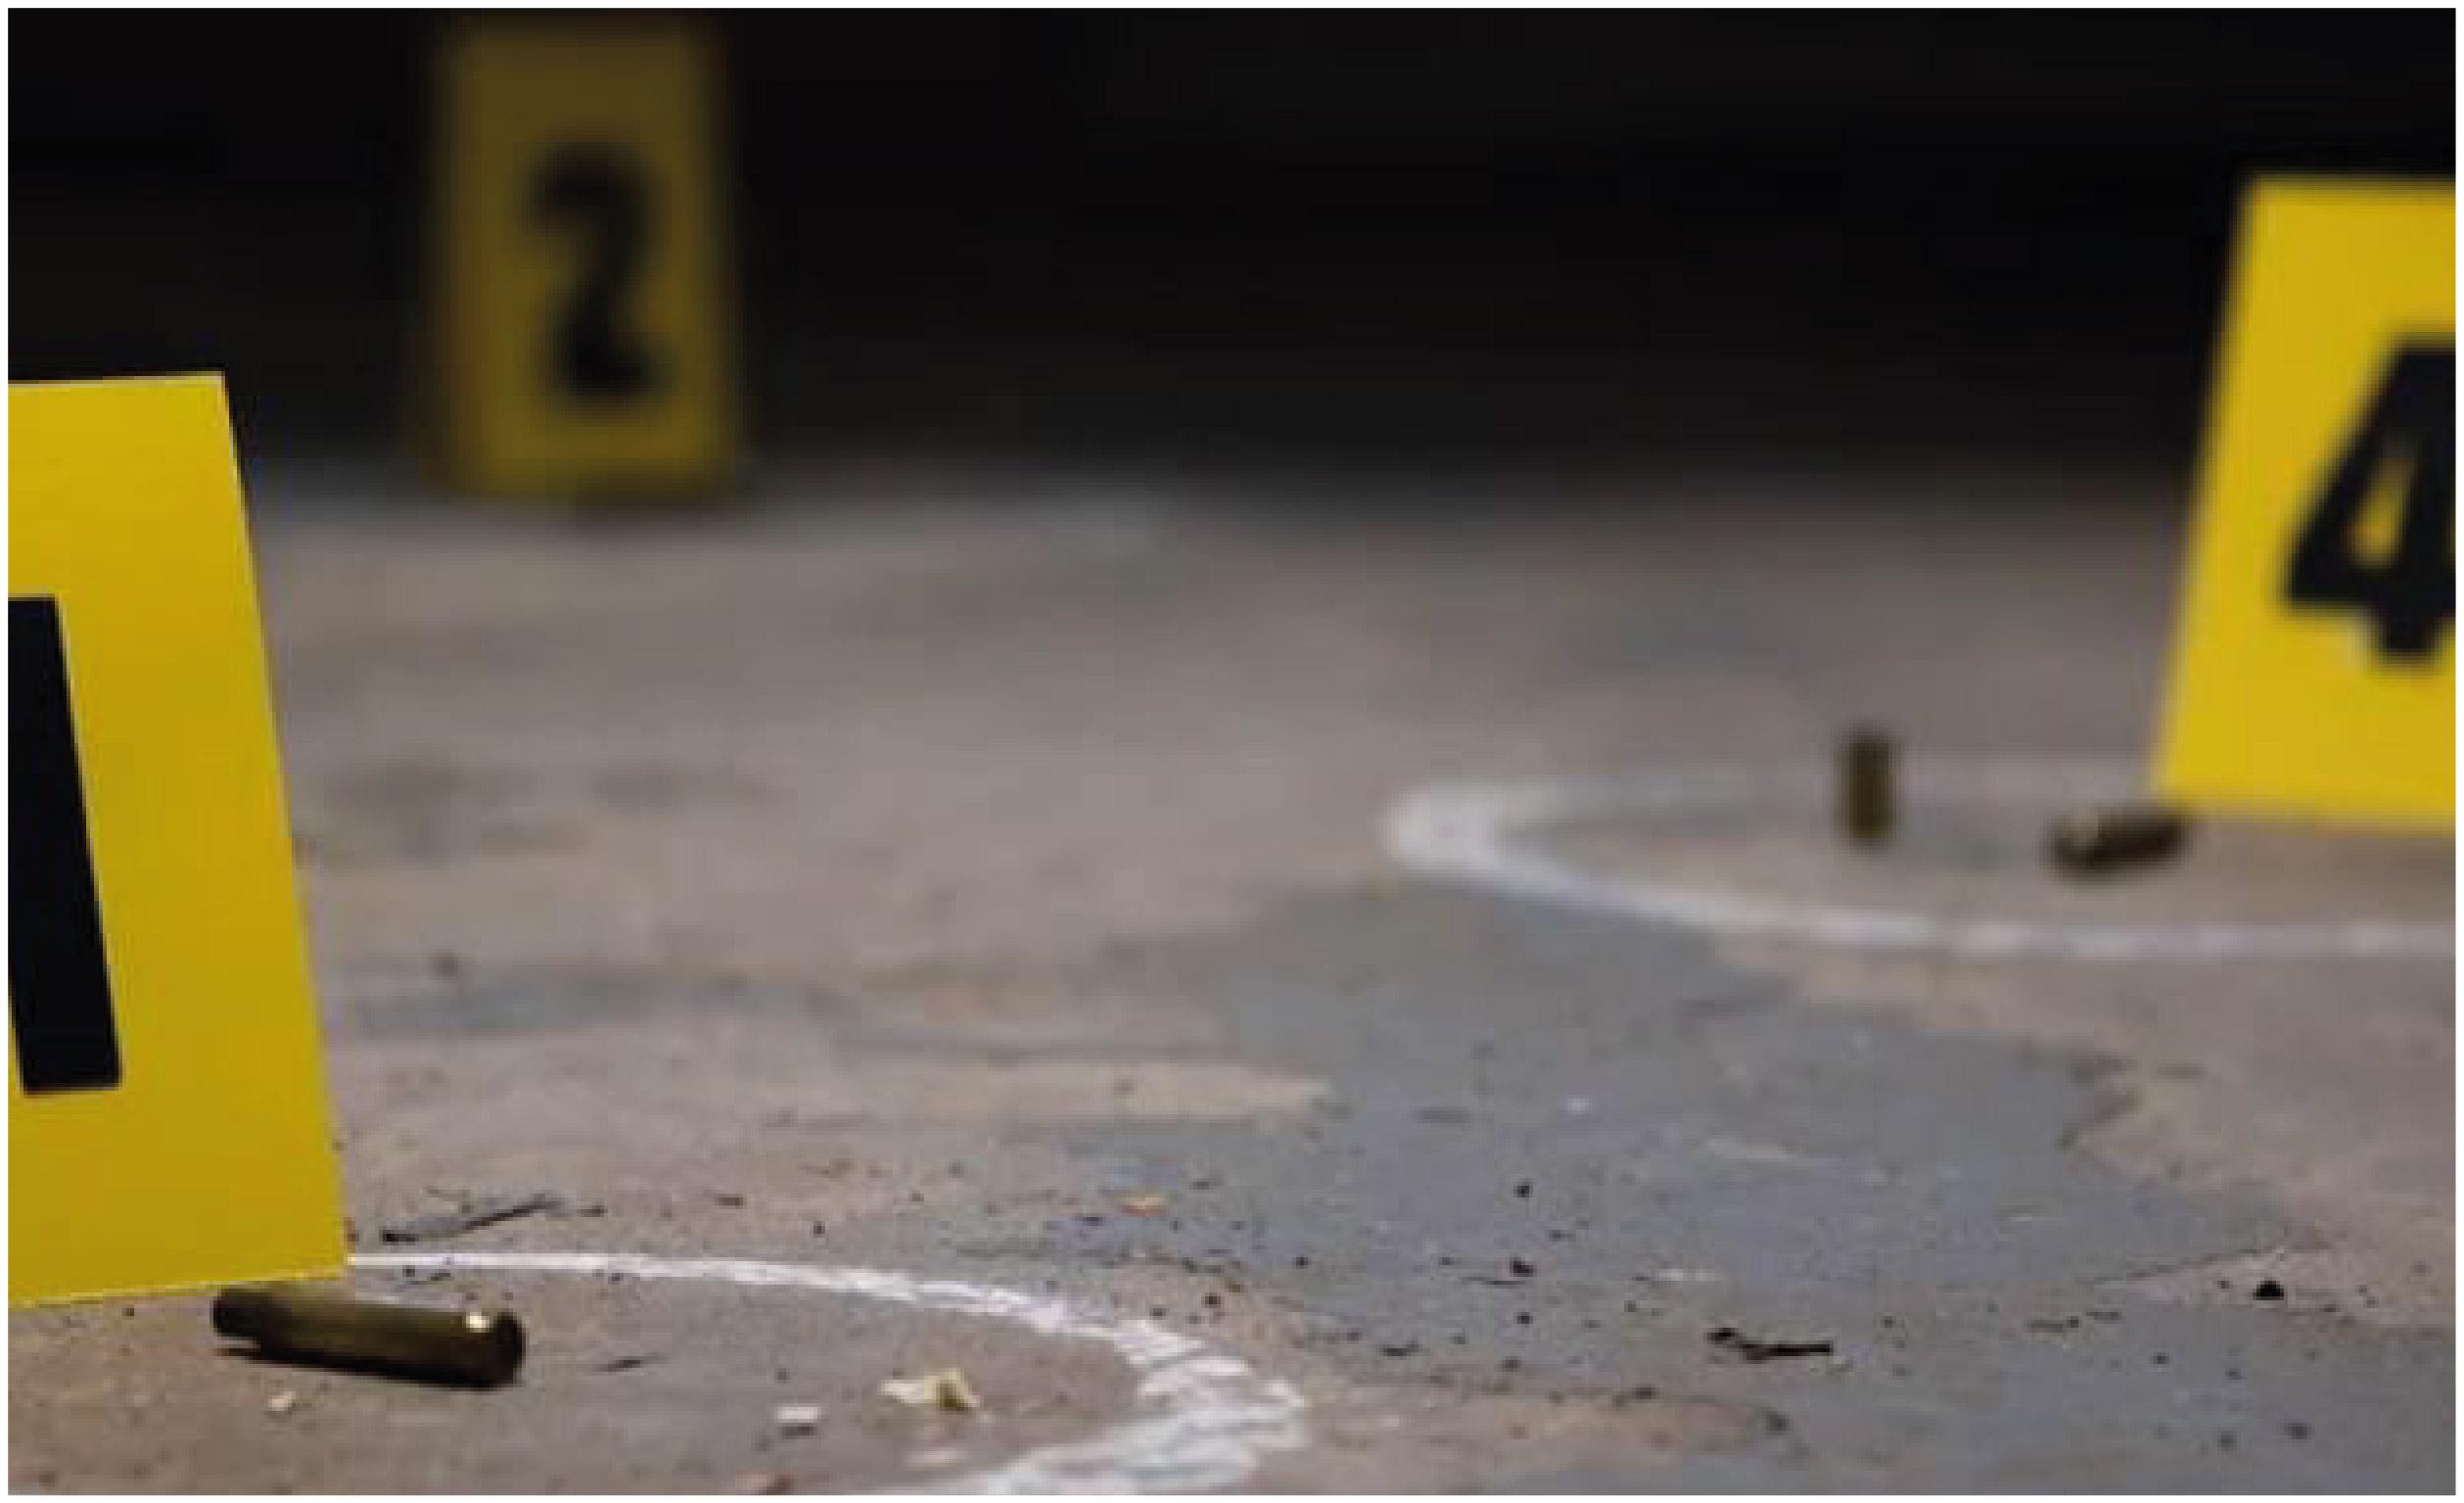 Menor de edad murió en medio de riña en bar de Vegachí, Antioquia | EL FRENTE